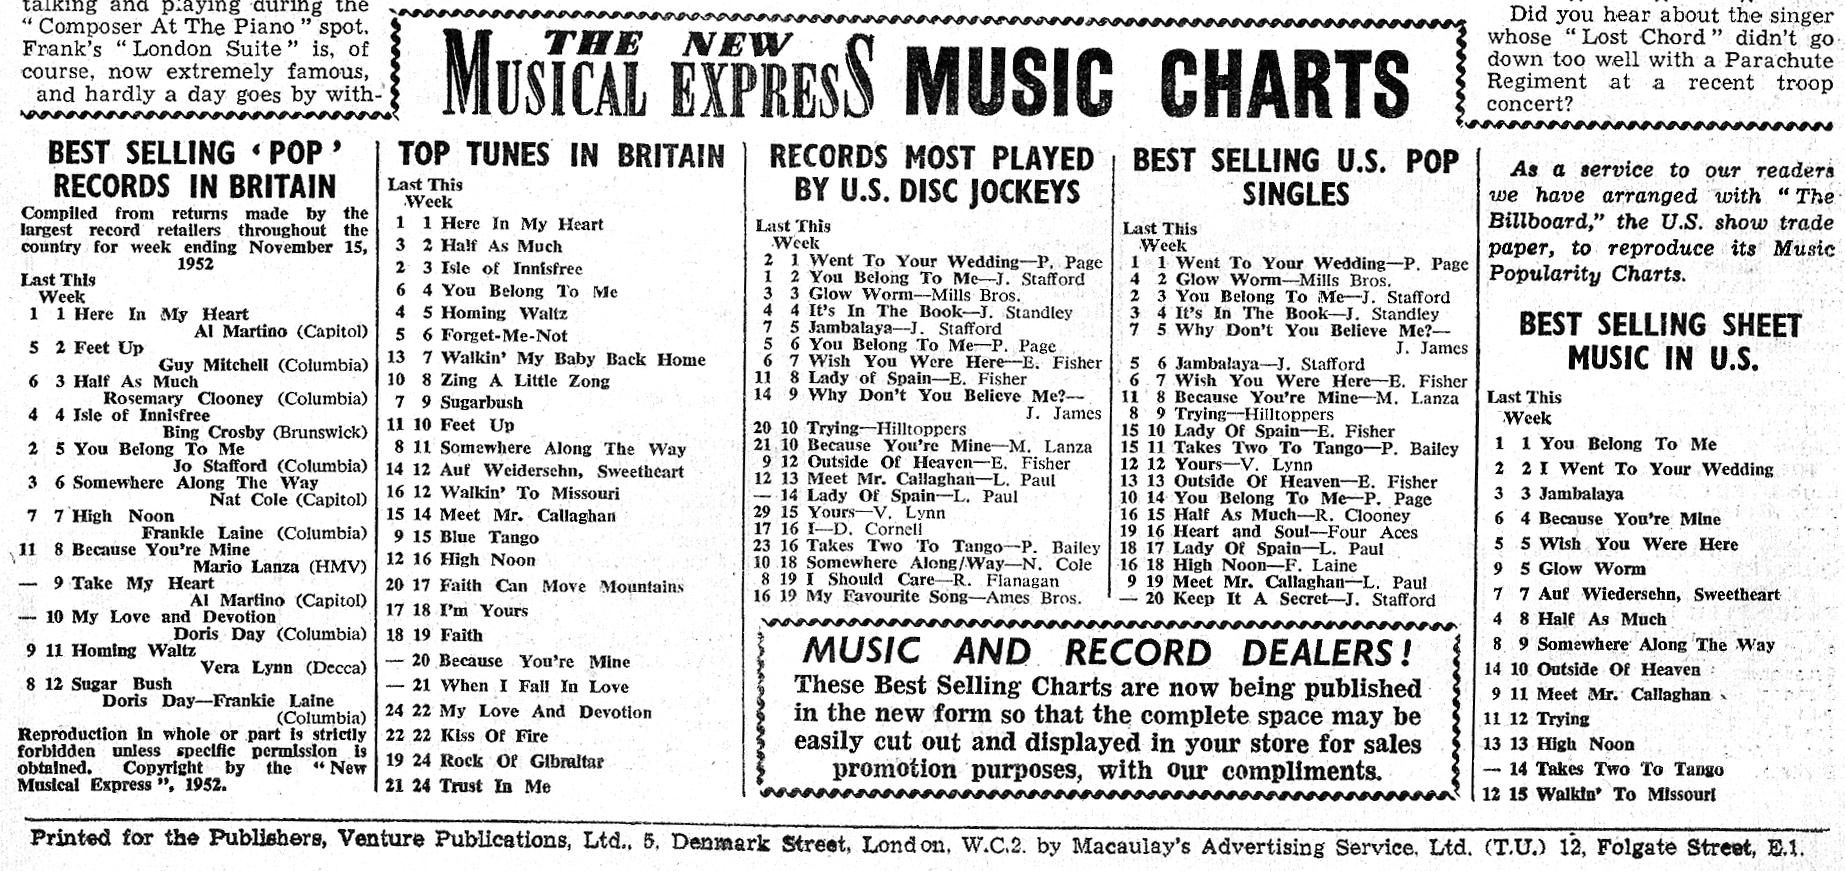 November 14, 1952: The UK's First Singles Chart